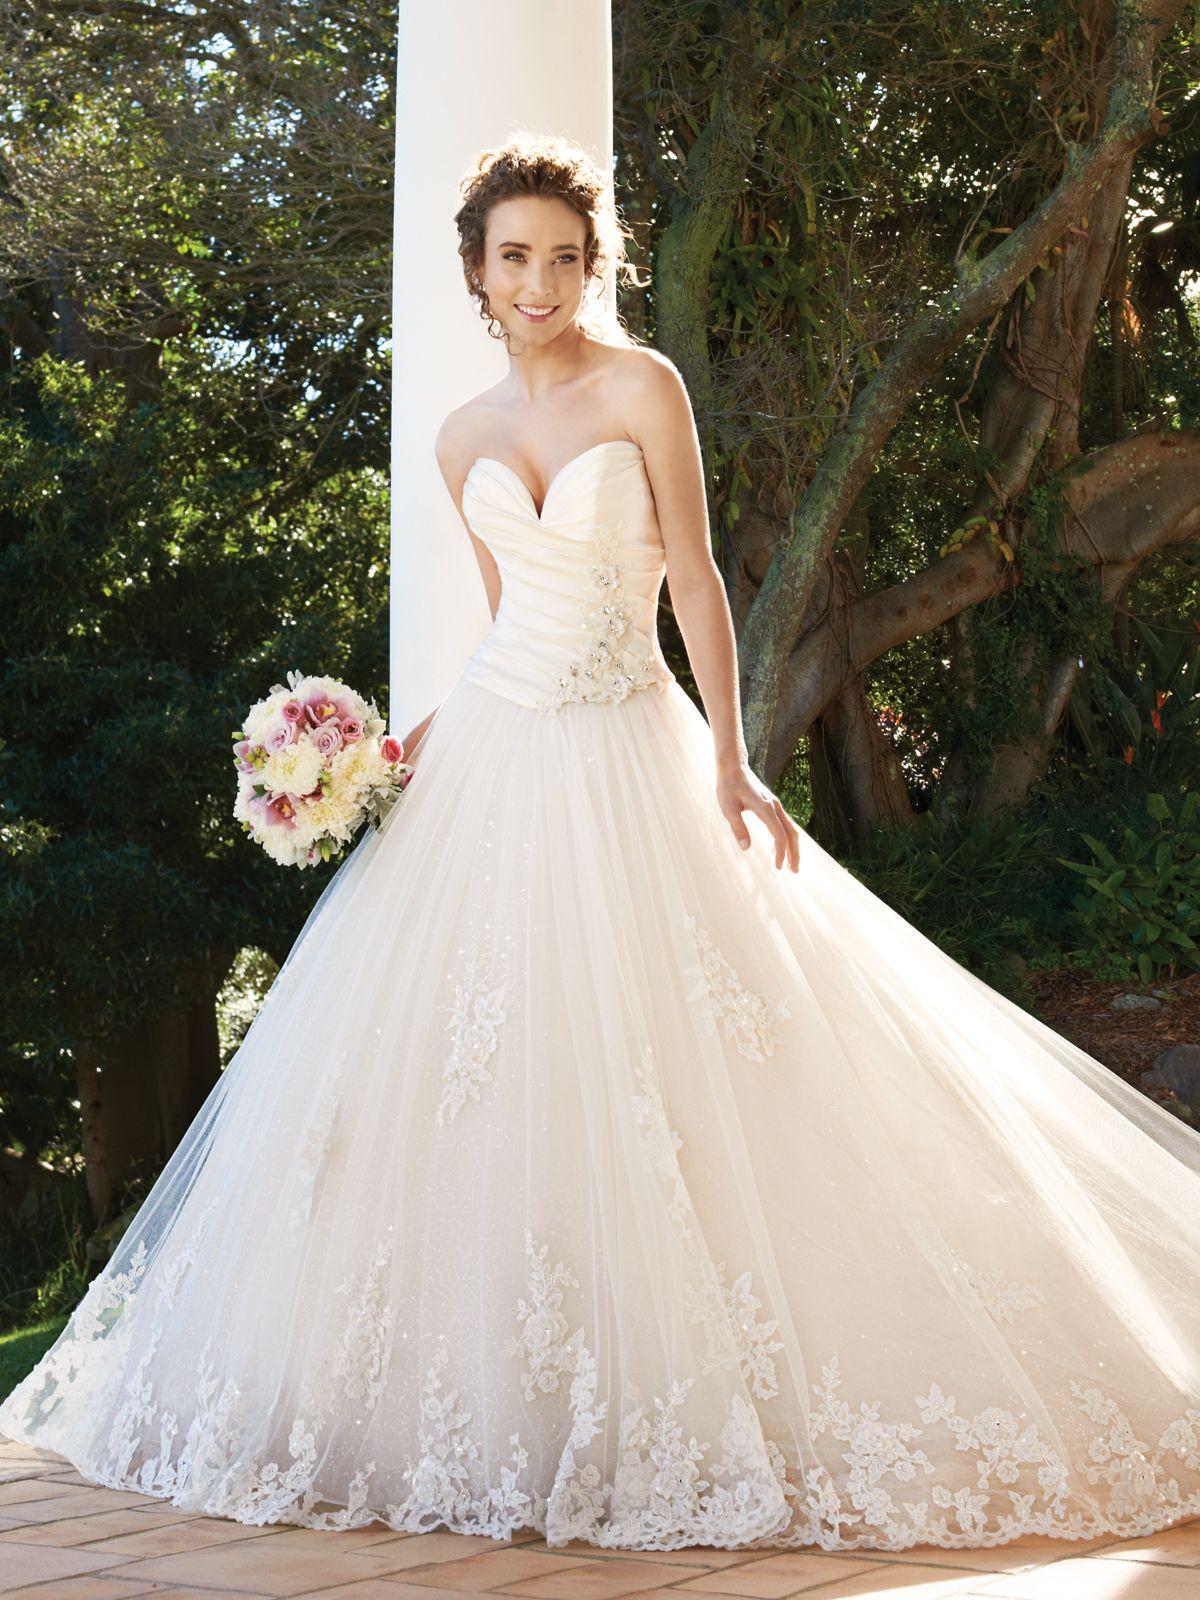 Spring sophia tolli strapless ball gown wedding dress in paris